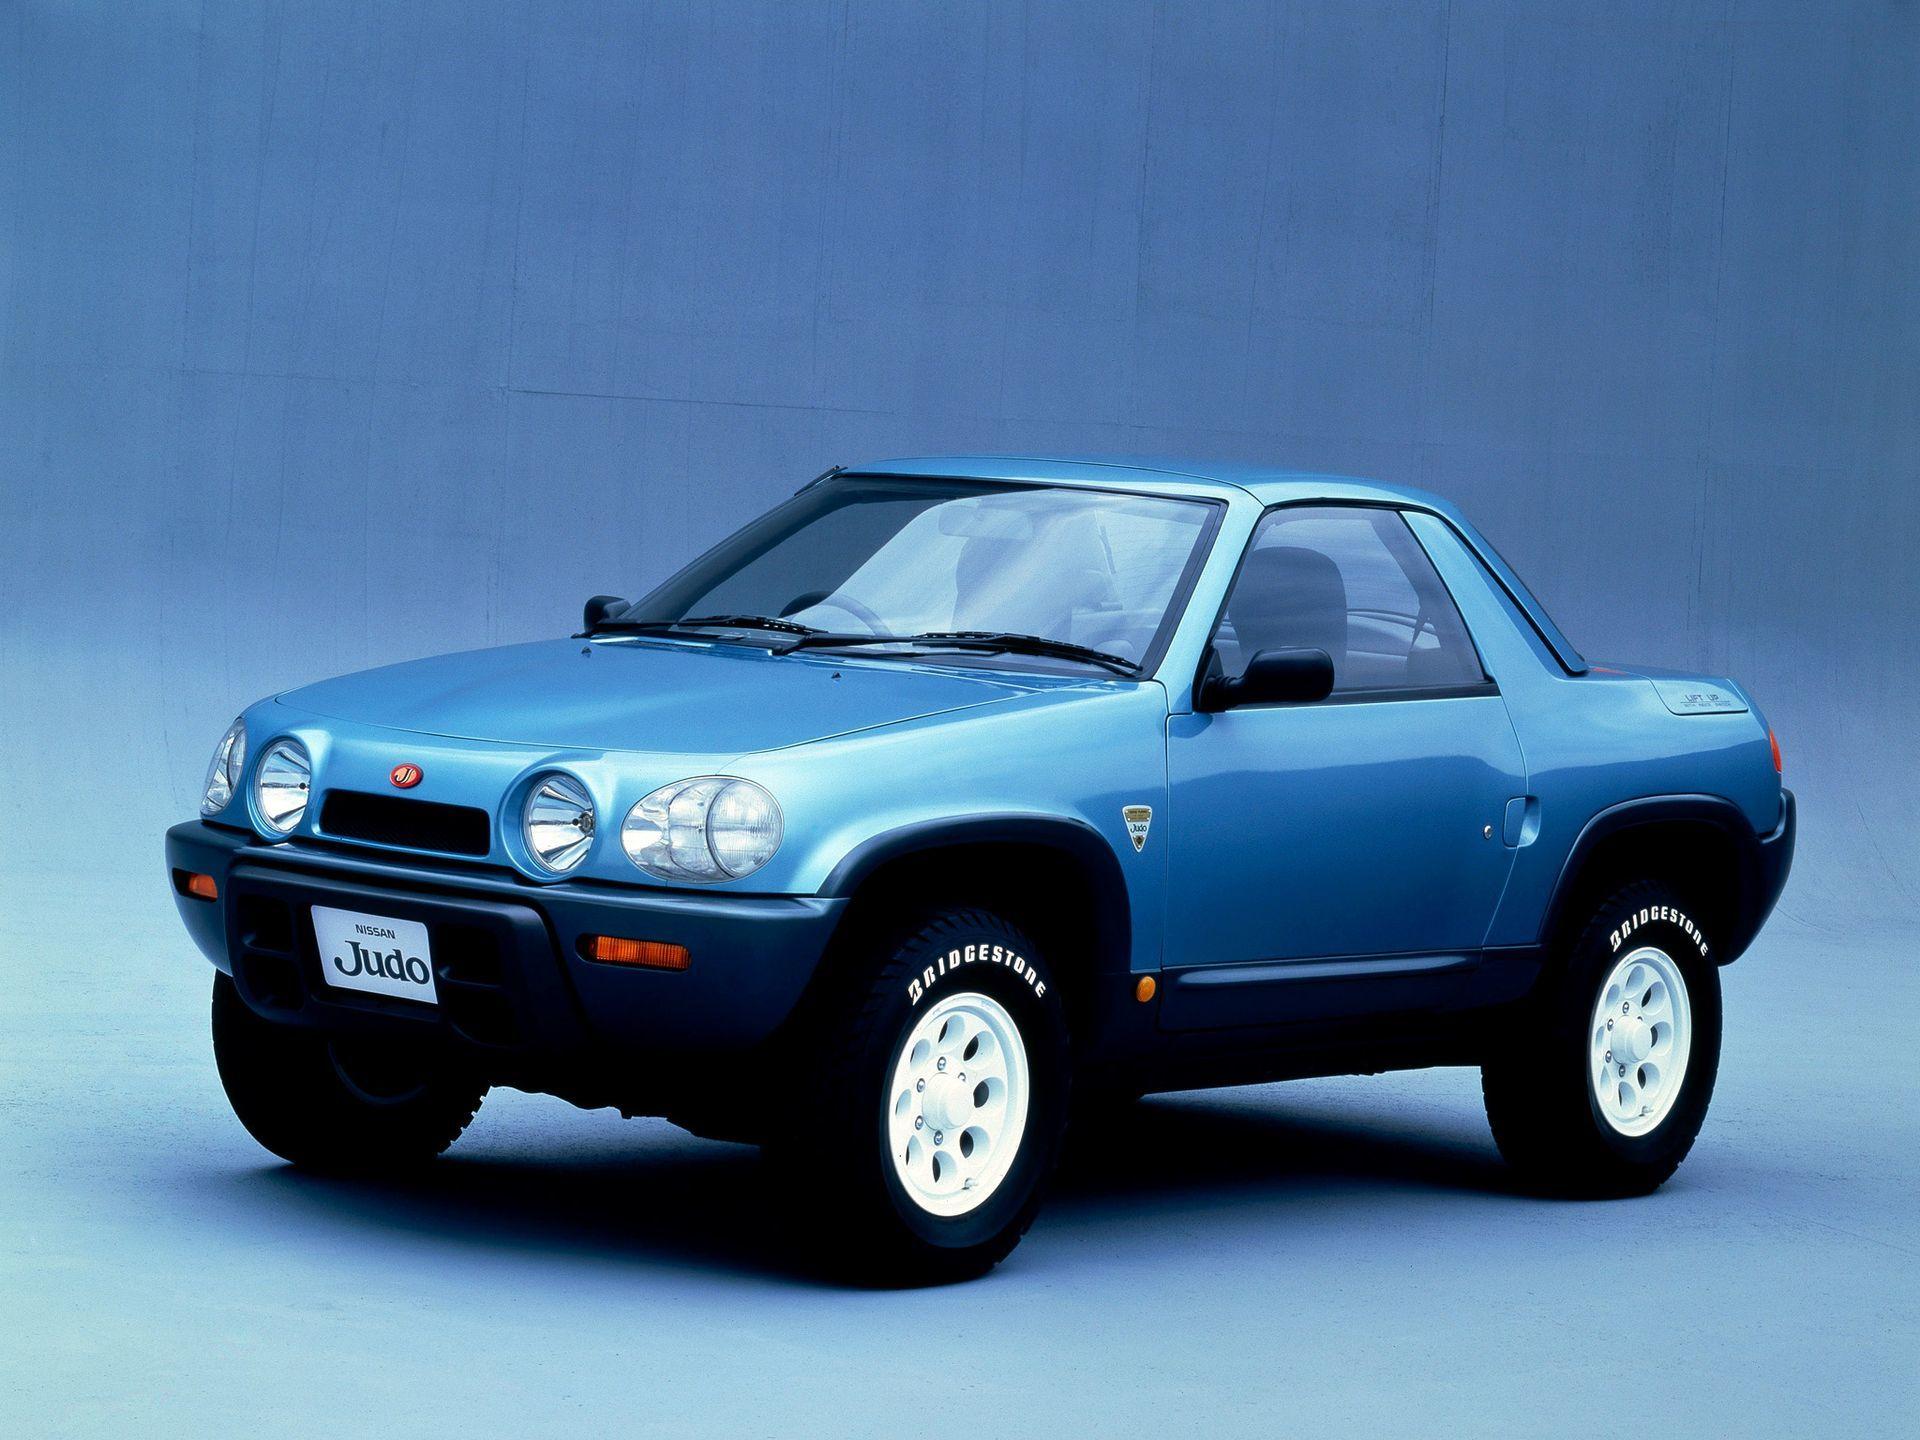 Nissan Judo Concept 18